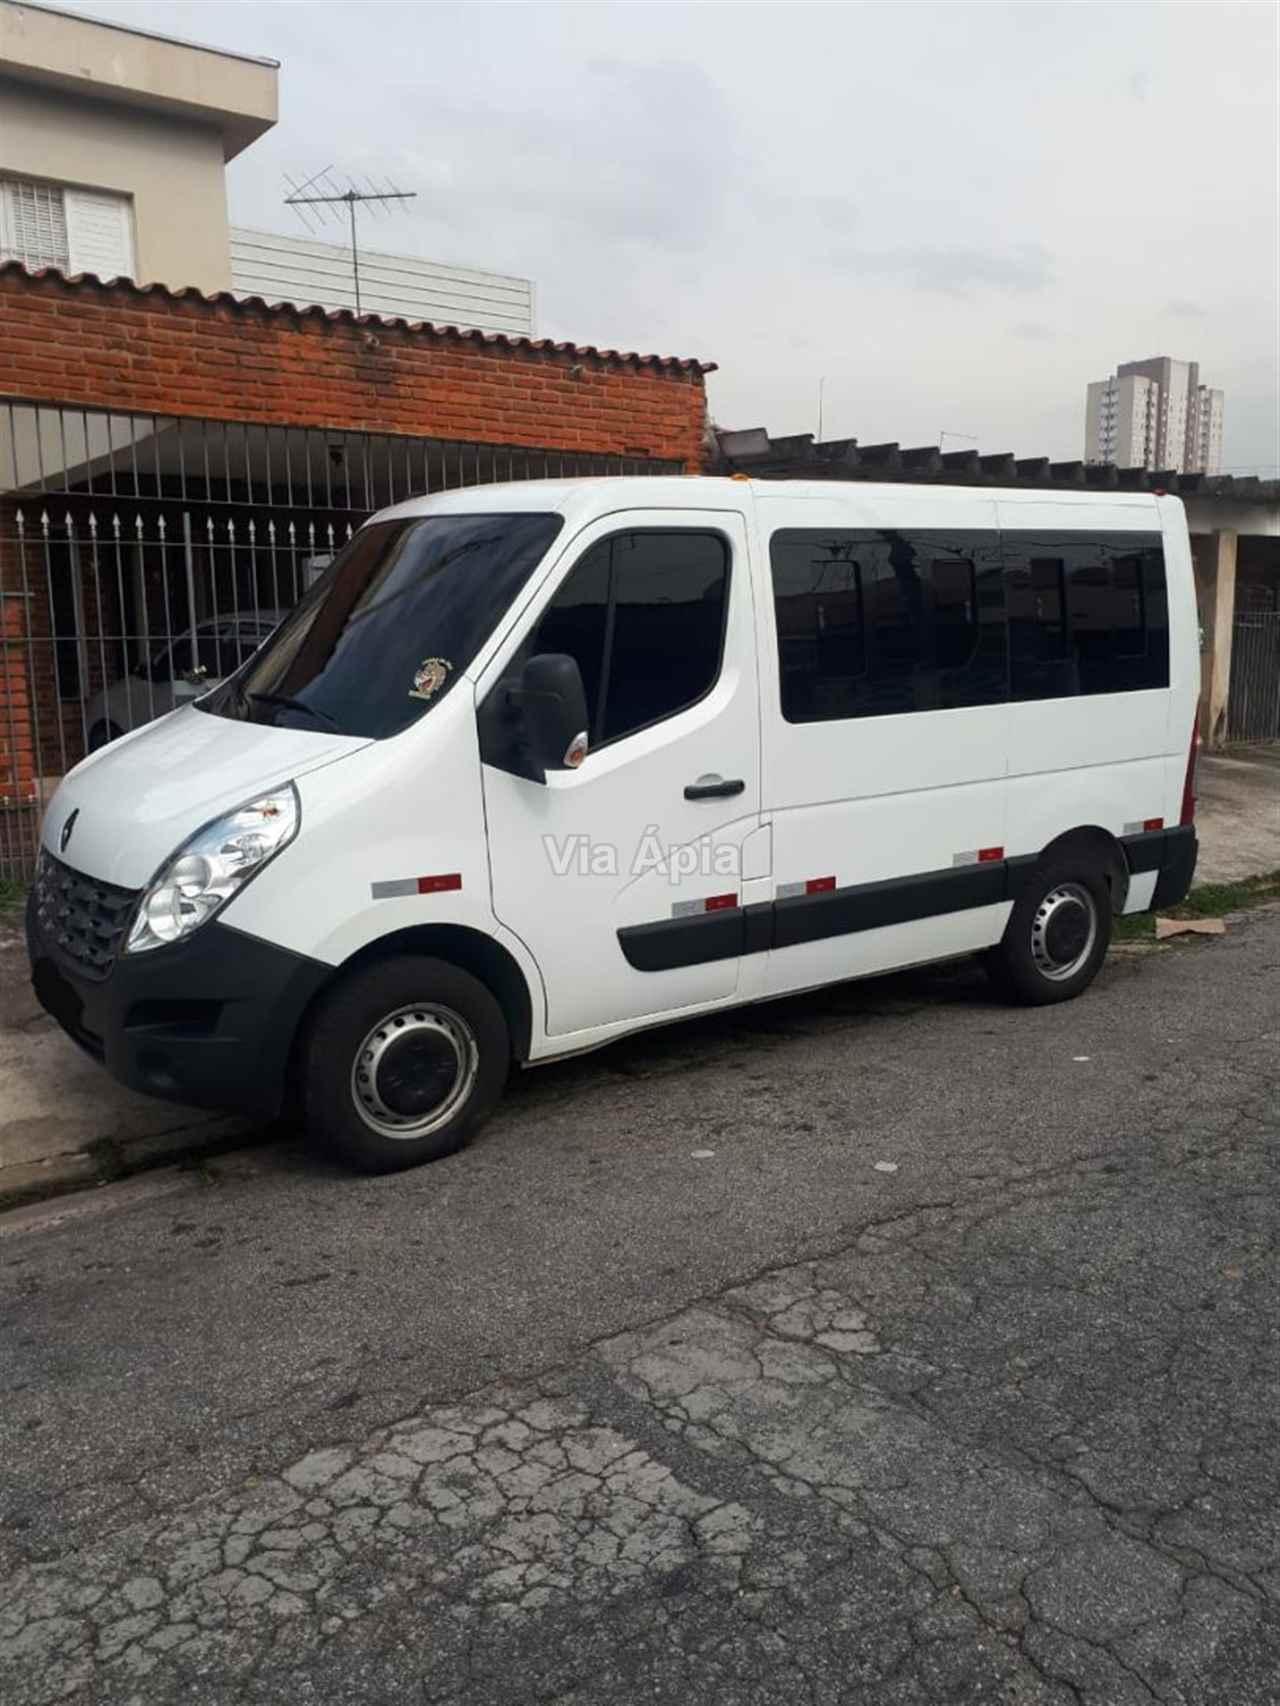 VANS RENAULT Master Minibus 2.5 Via Ápia Caminhões SAO PAULO SÃO PAULO SP